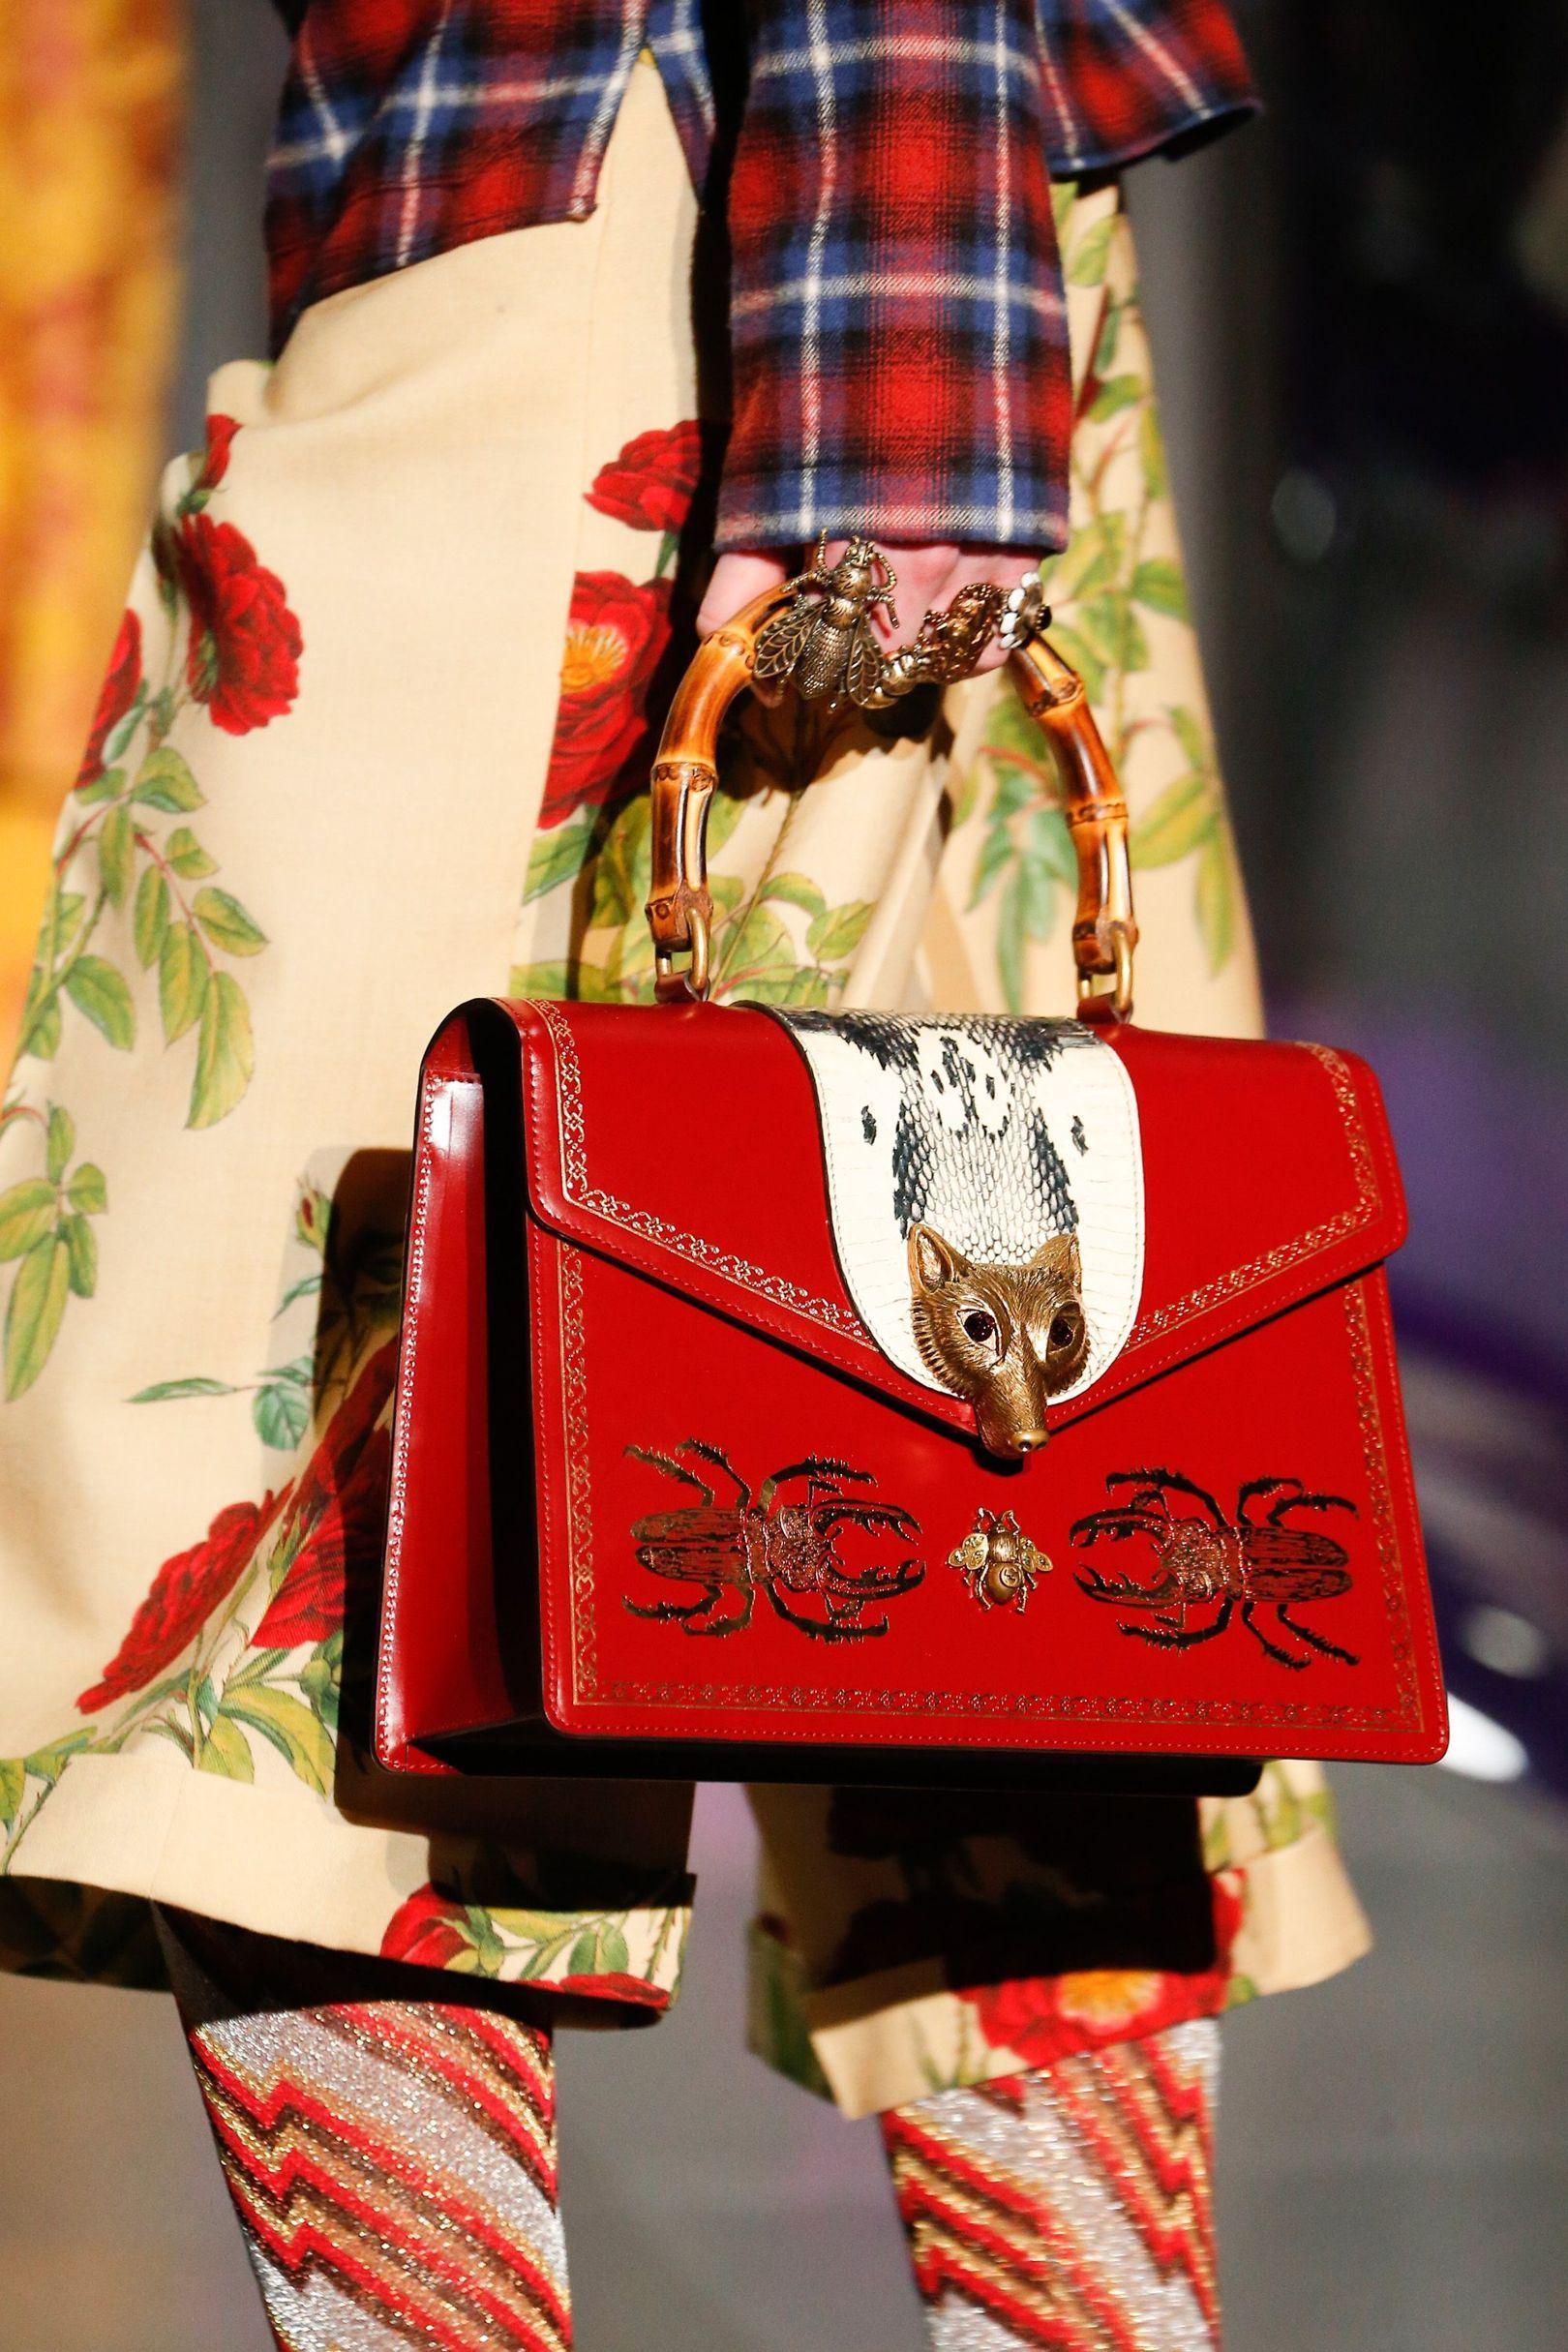 The Best Designer Bags From Autumn Winter 2017 Catwalks So Far